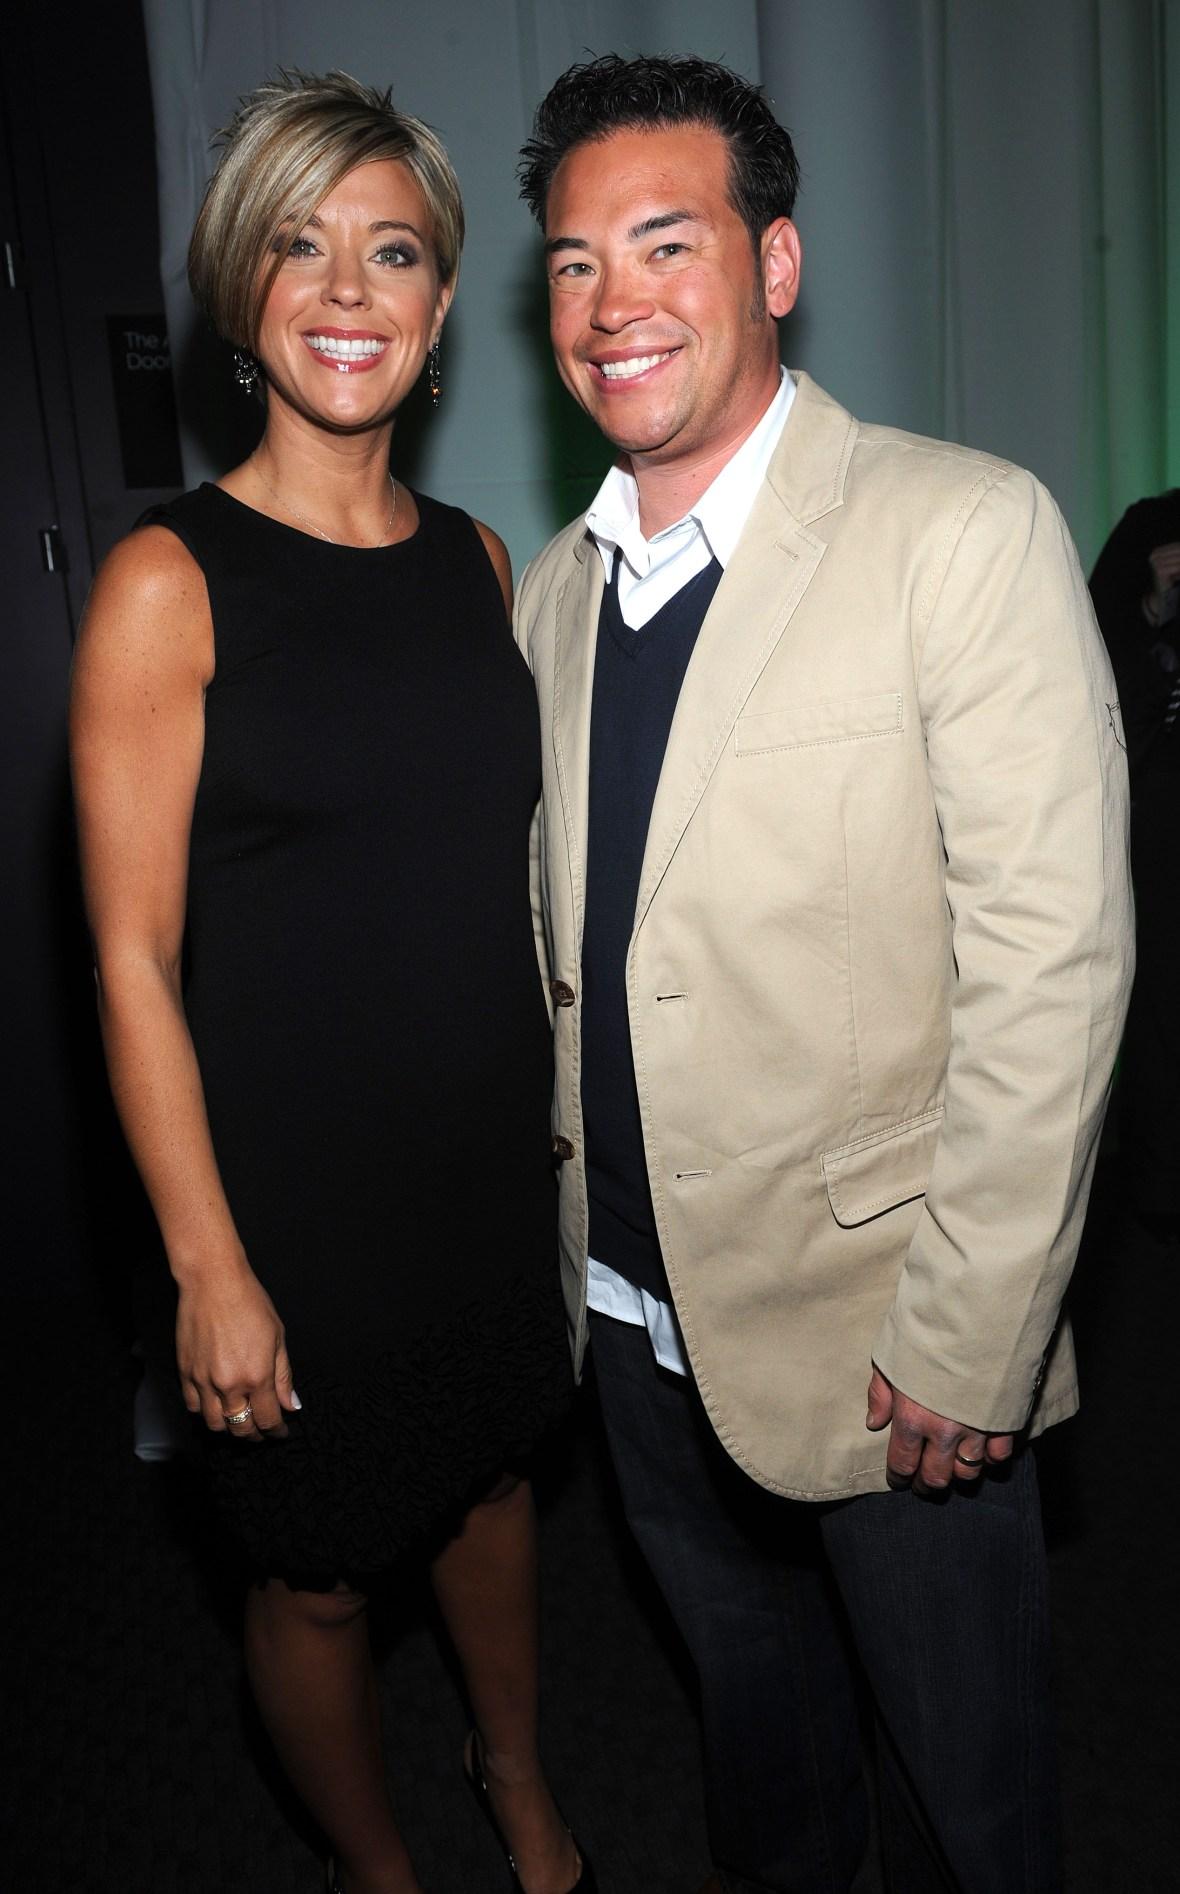 jon and kate gosselin 2009